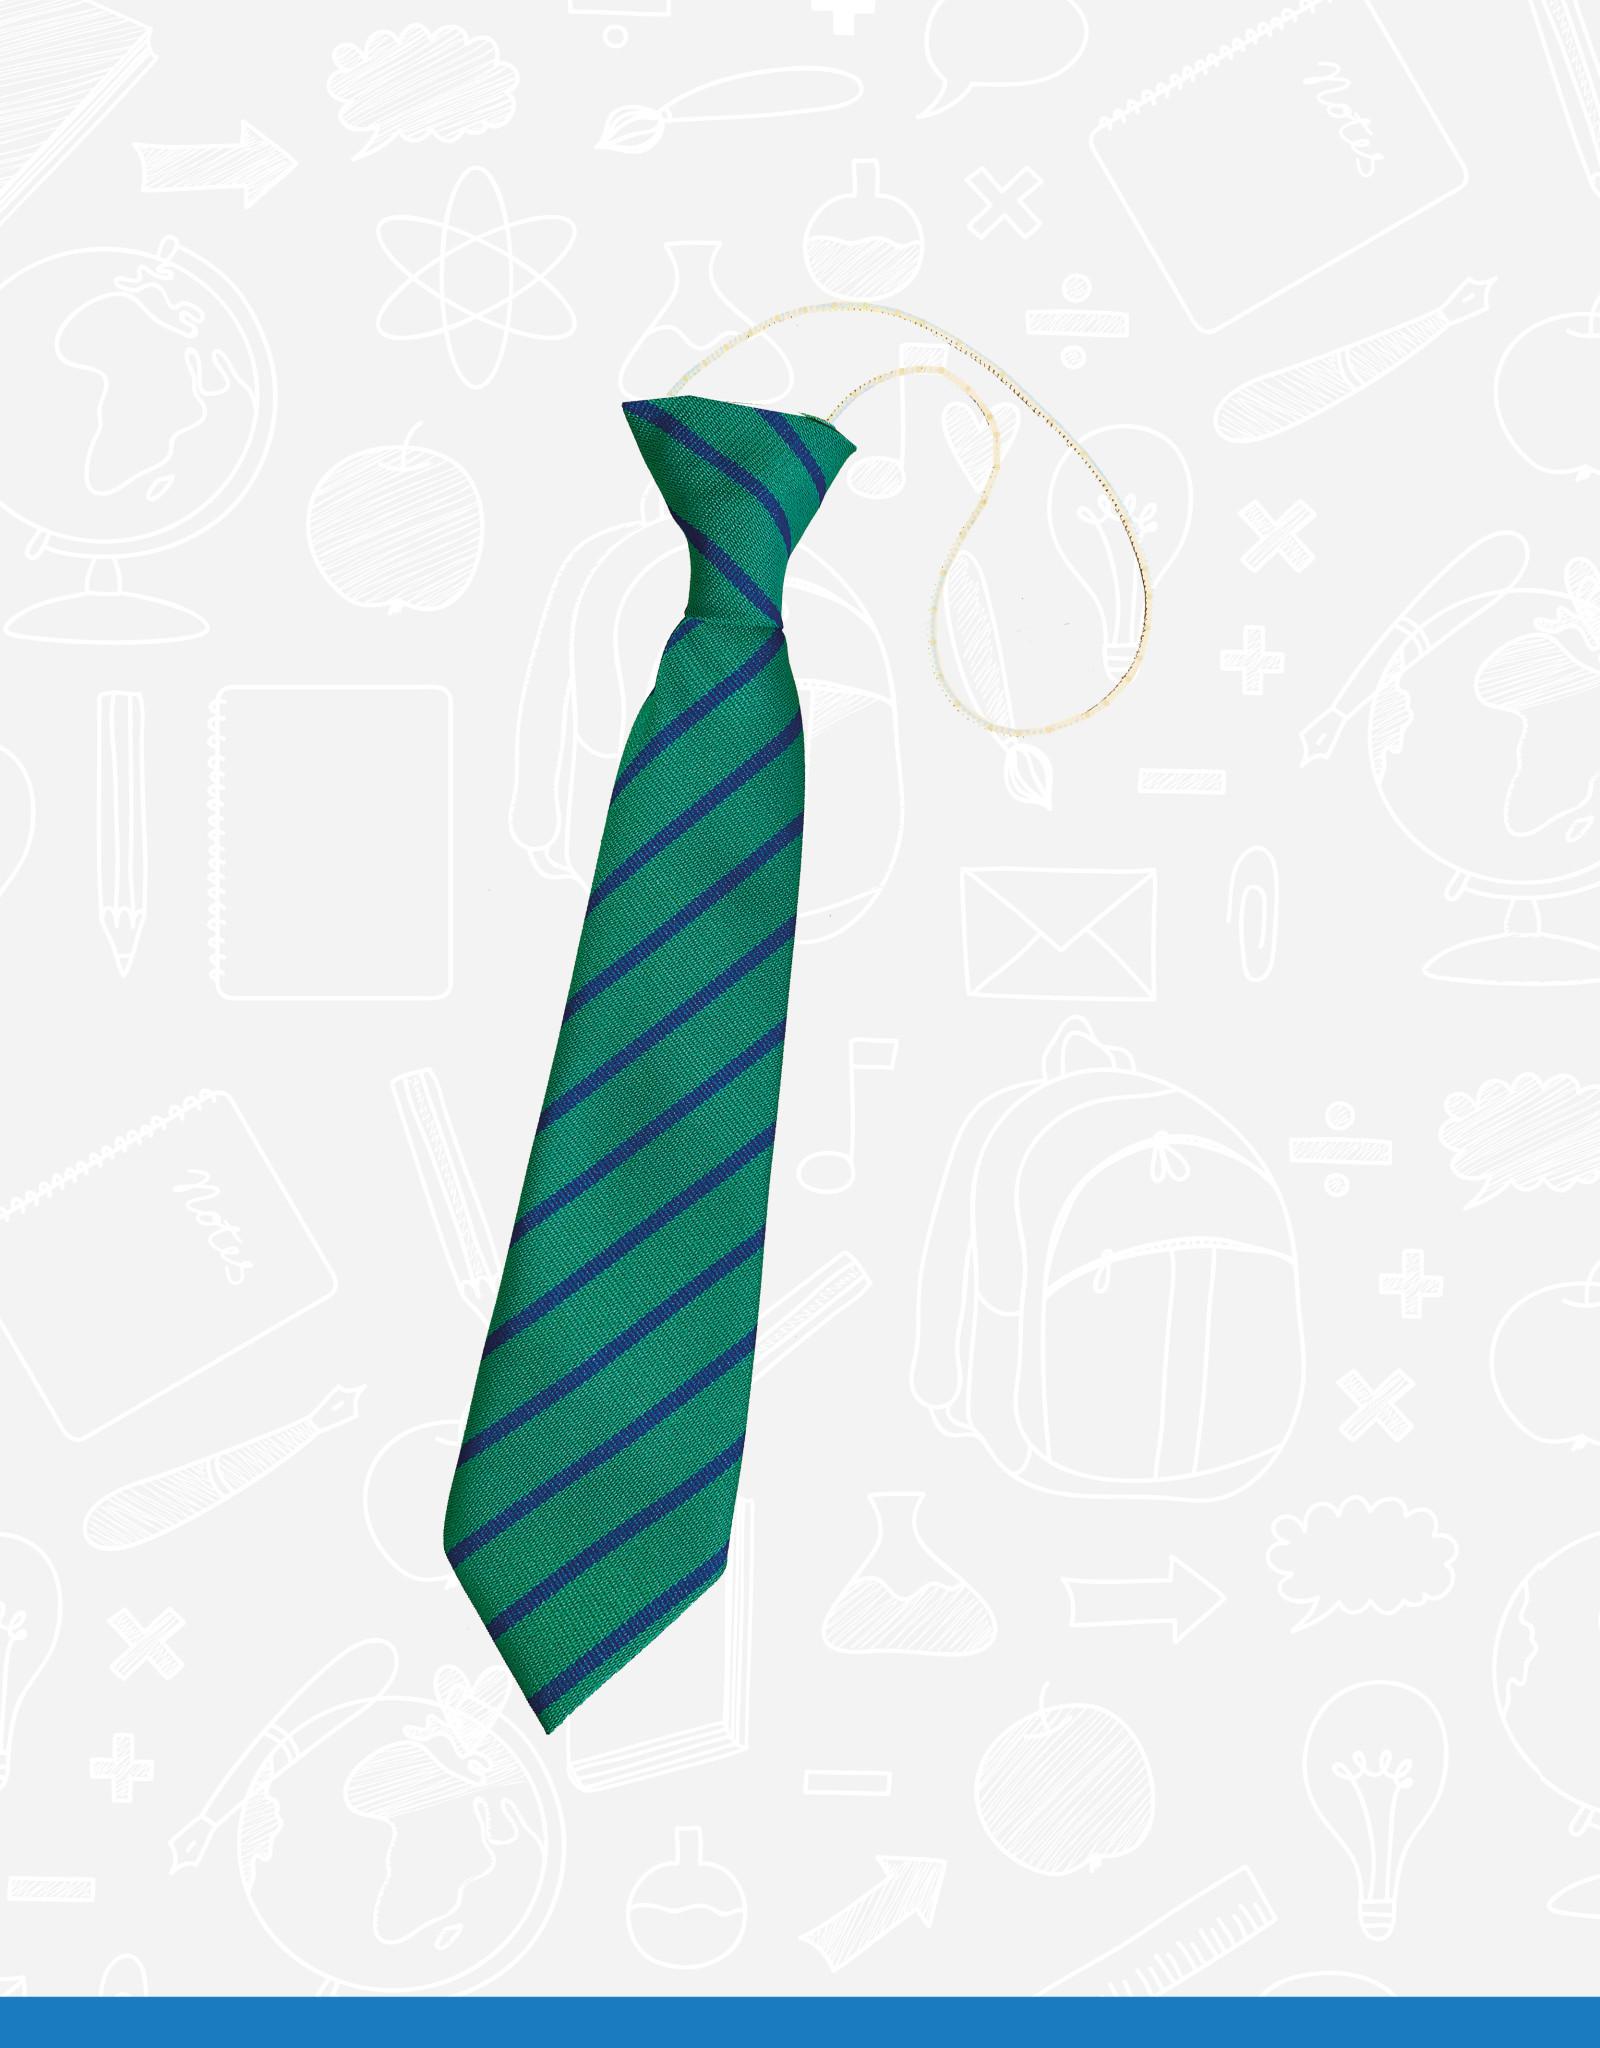 TSW Ties Bangor Central Elasticated Tie